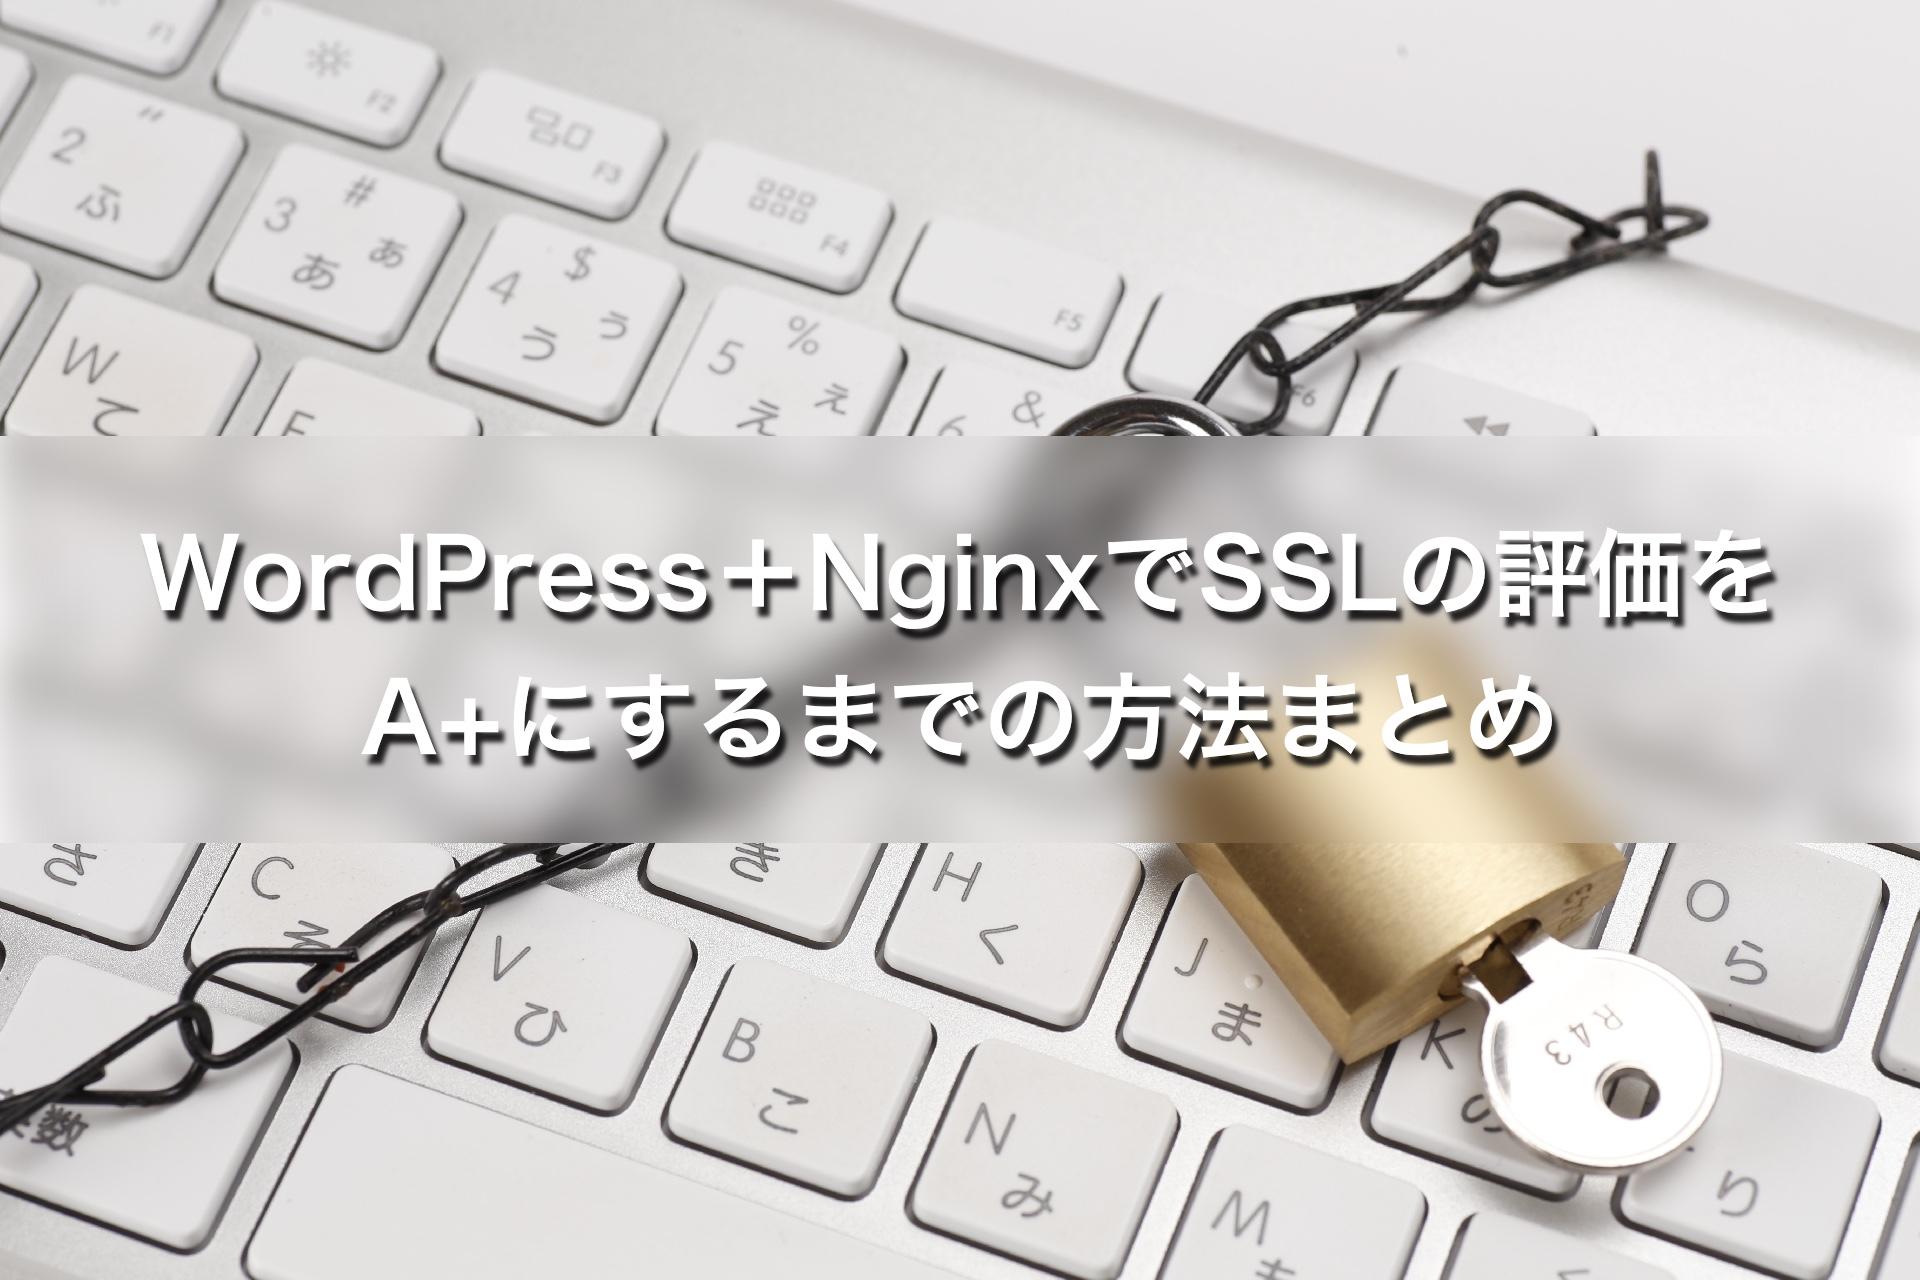 WordPress+NginxでSSLの評価をA+にするまでの方法まとめ